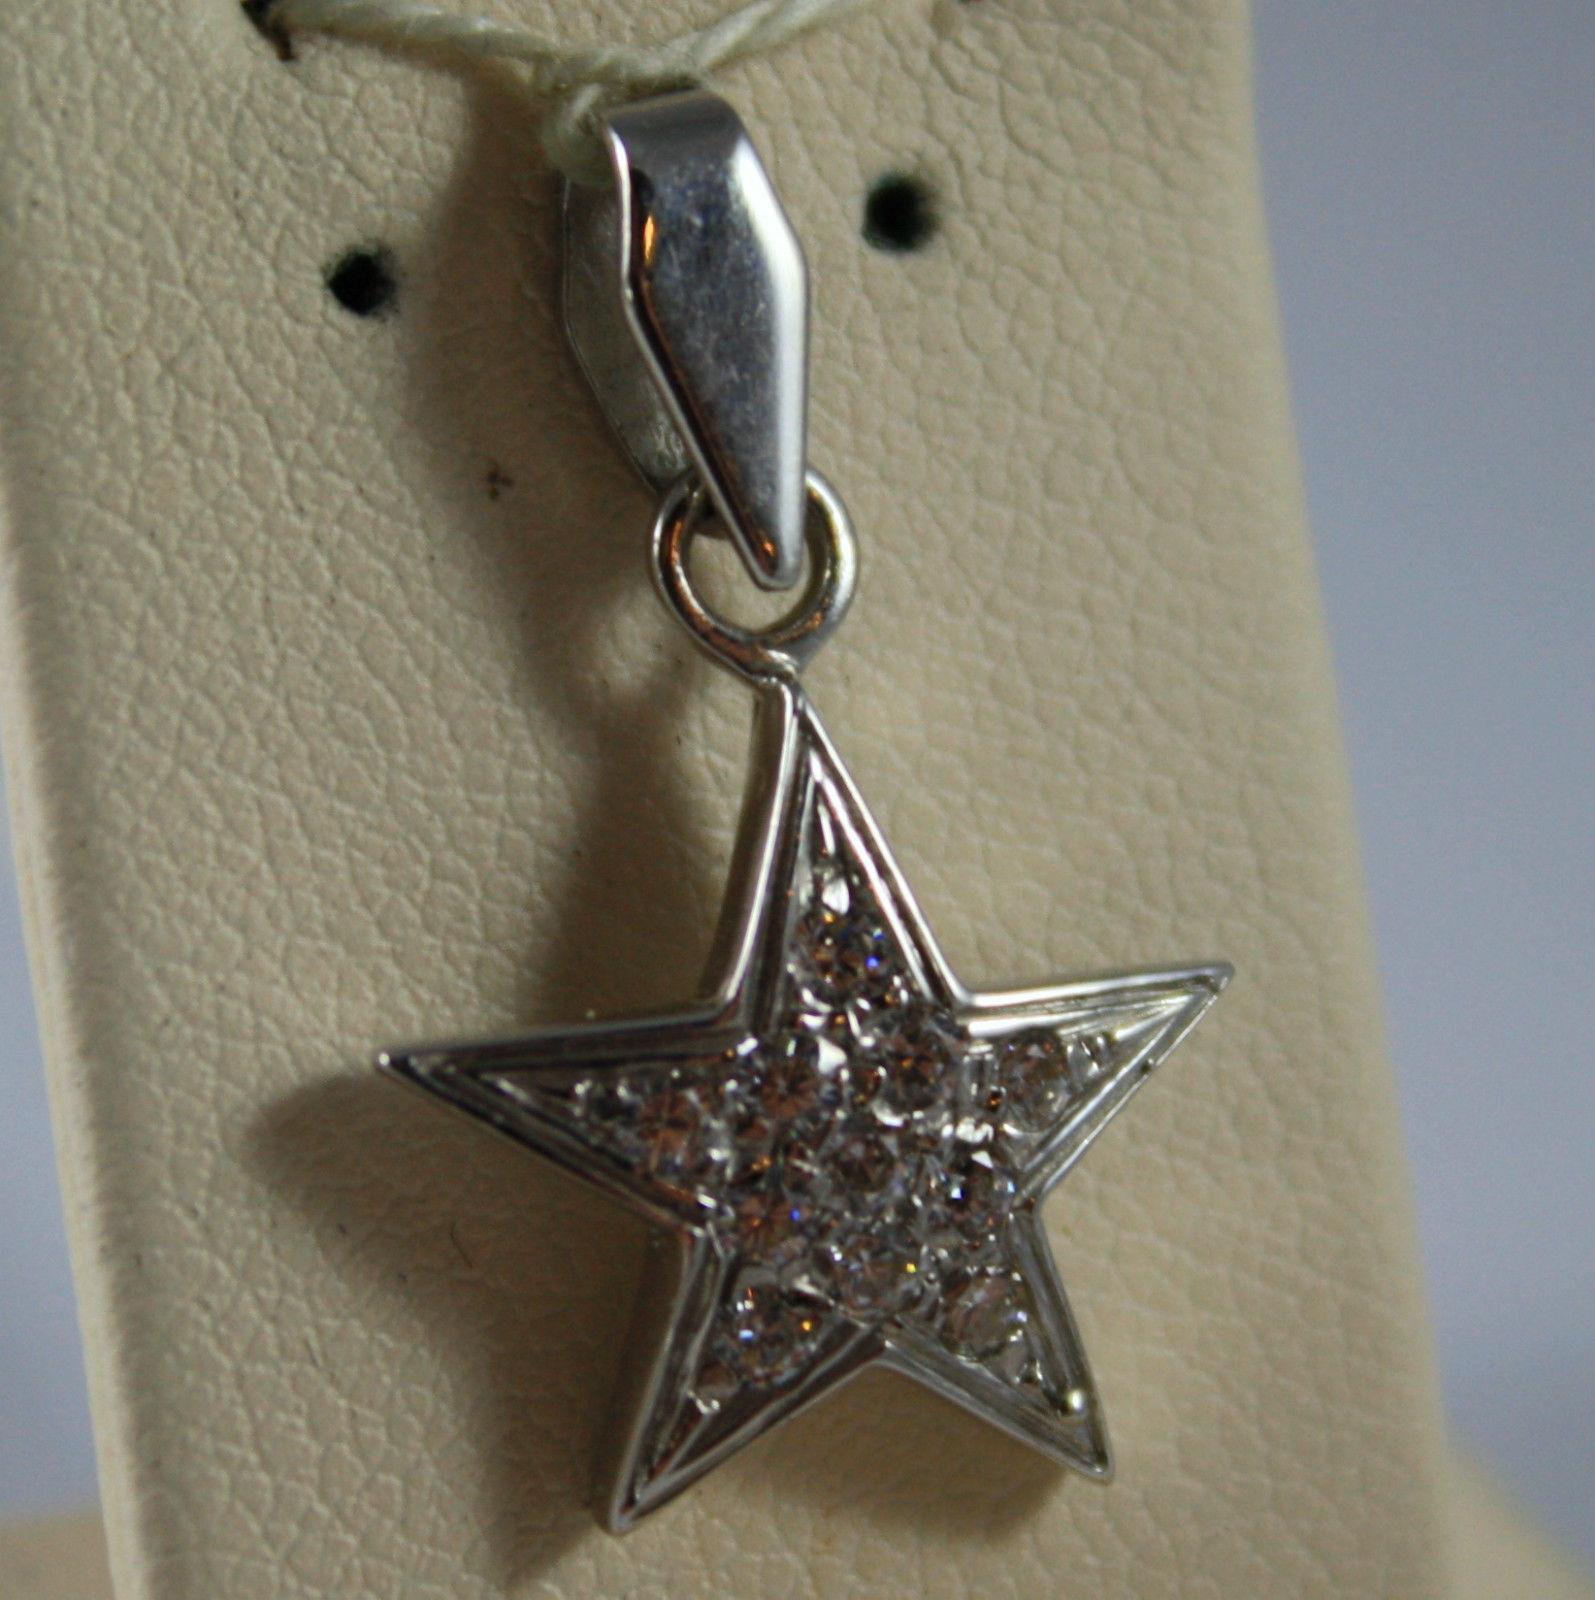 White Gold Pendant 750 18k, Pendant Star, with zirconia, 2.4 cm long